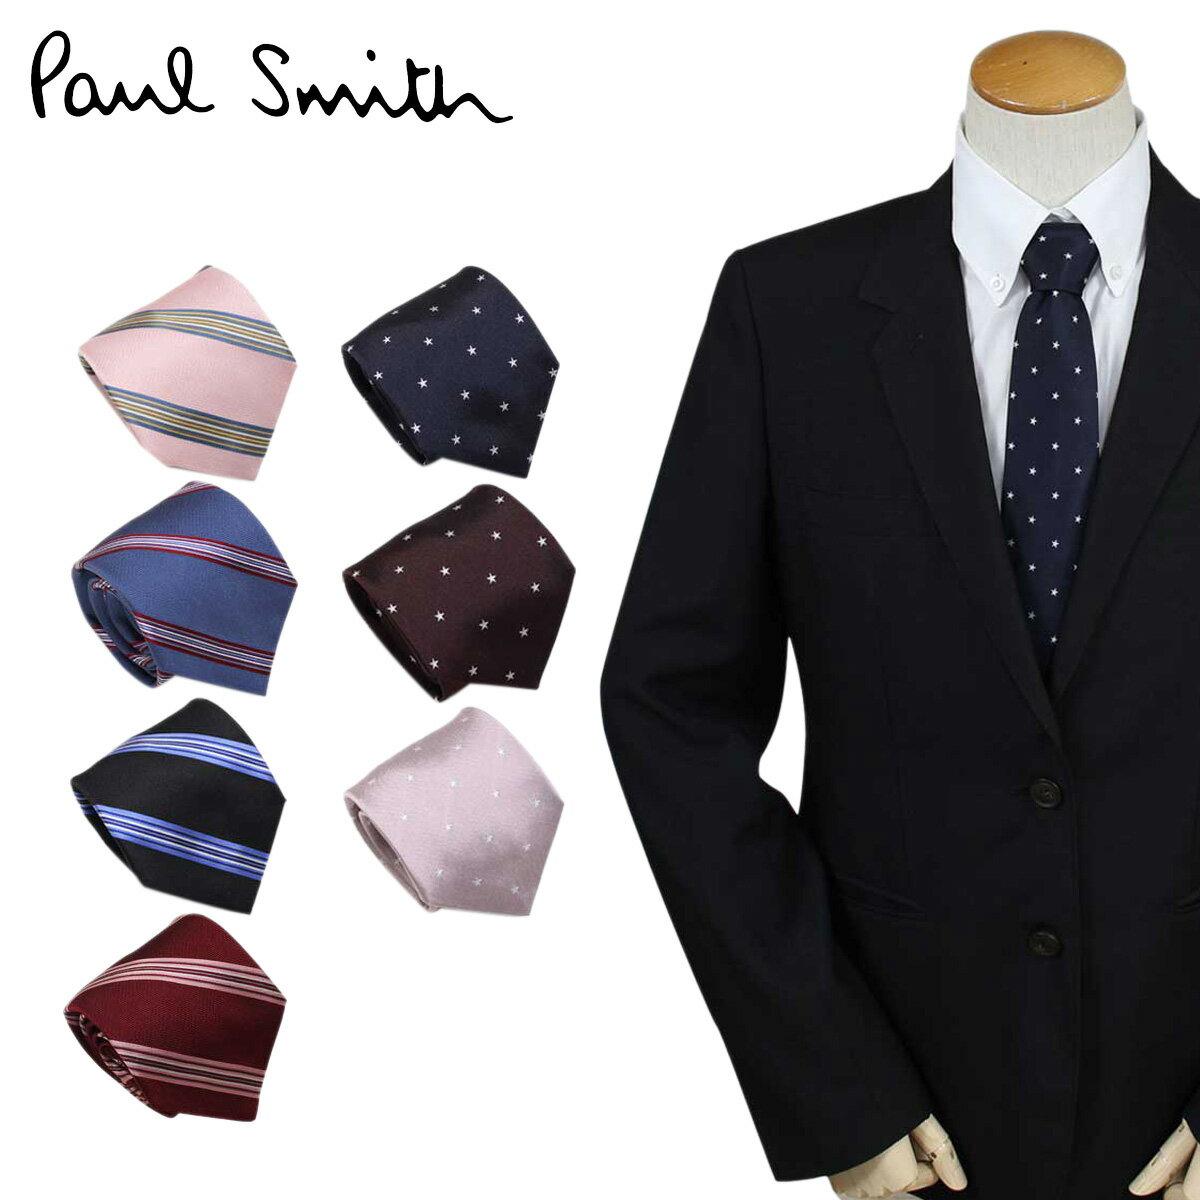 Paul Smith ネクタイ シルク メンズ ポールスミス ドット ストライプ ギフト ケース付 イタリア製 ビジネス 結婚式 [7/31 追加入荷] 【決算セール】